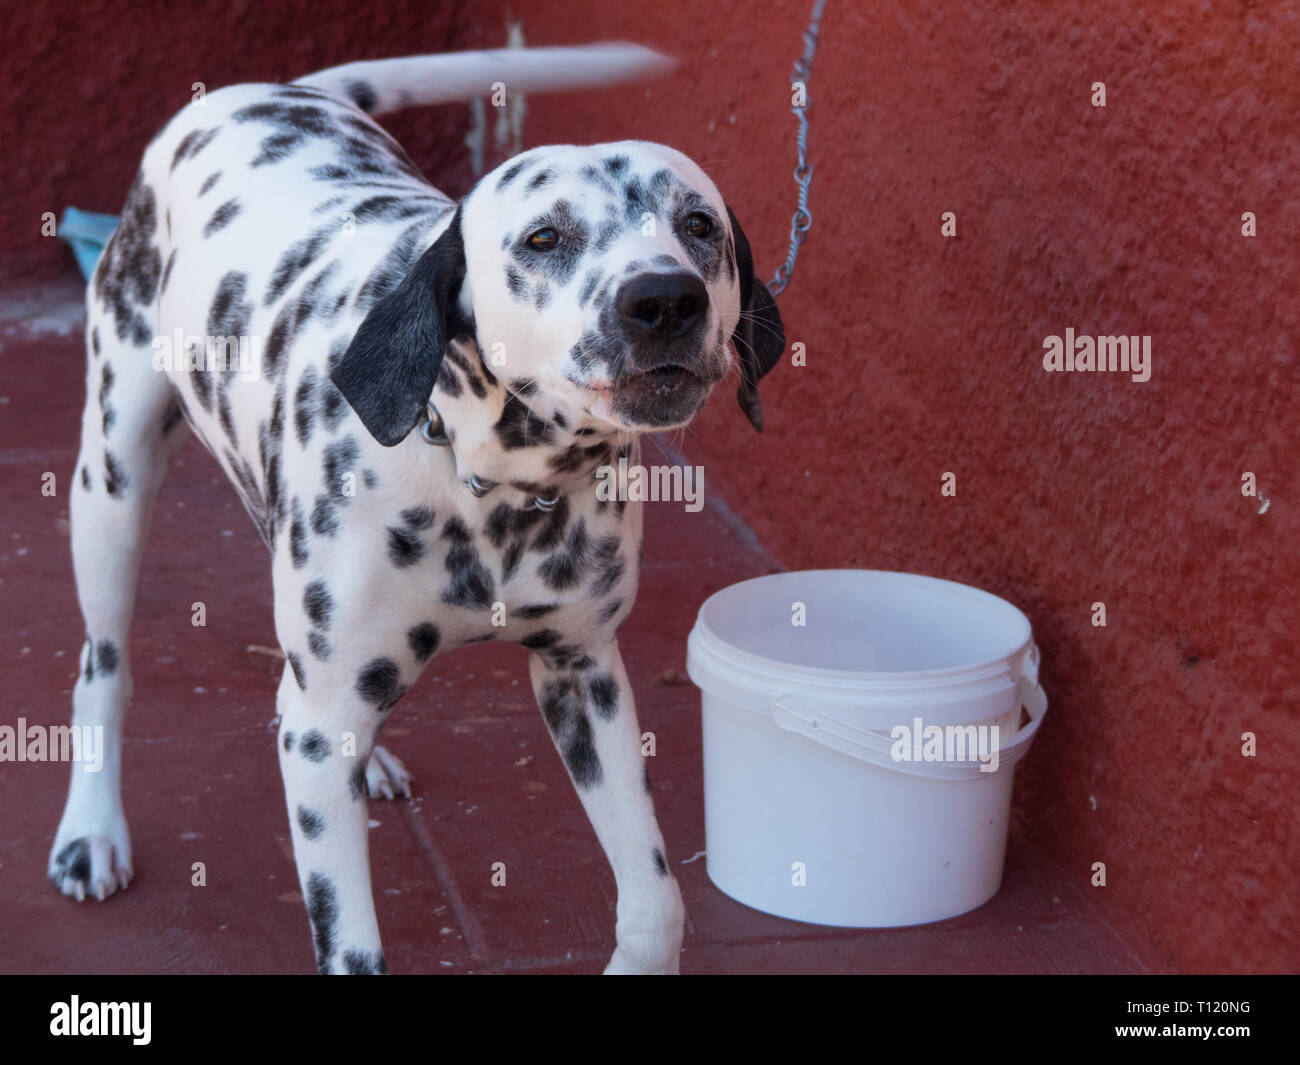 Dog Dalmatian barking outdoor red wall   - Stock Image